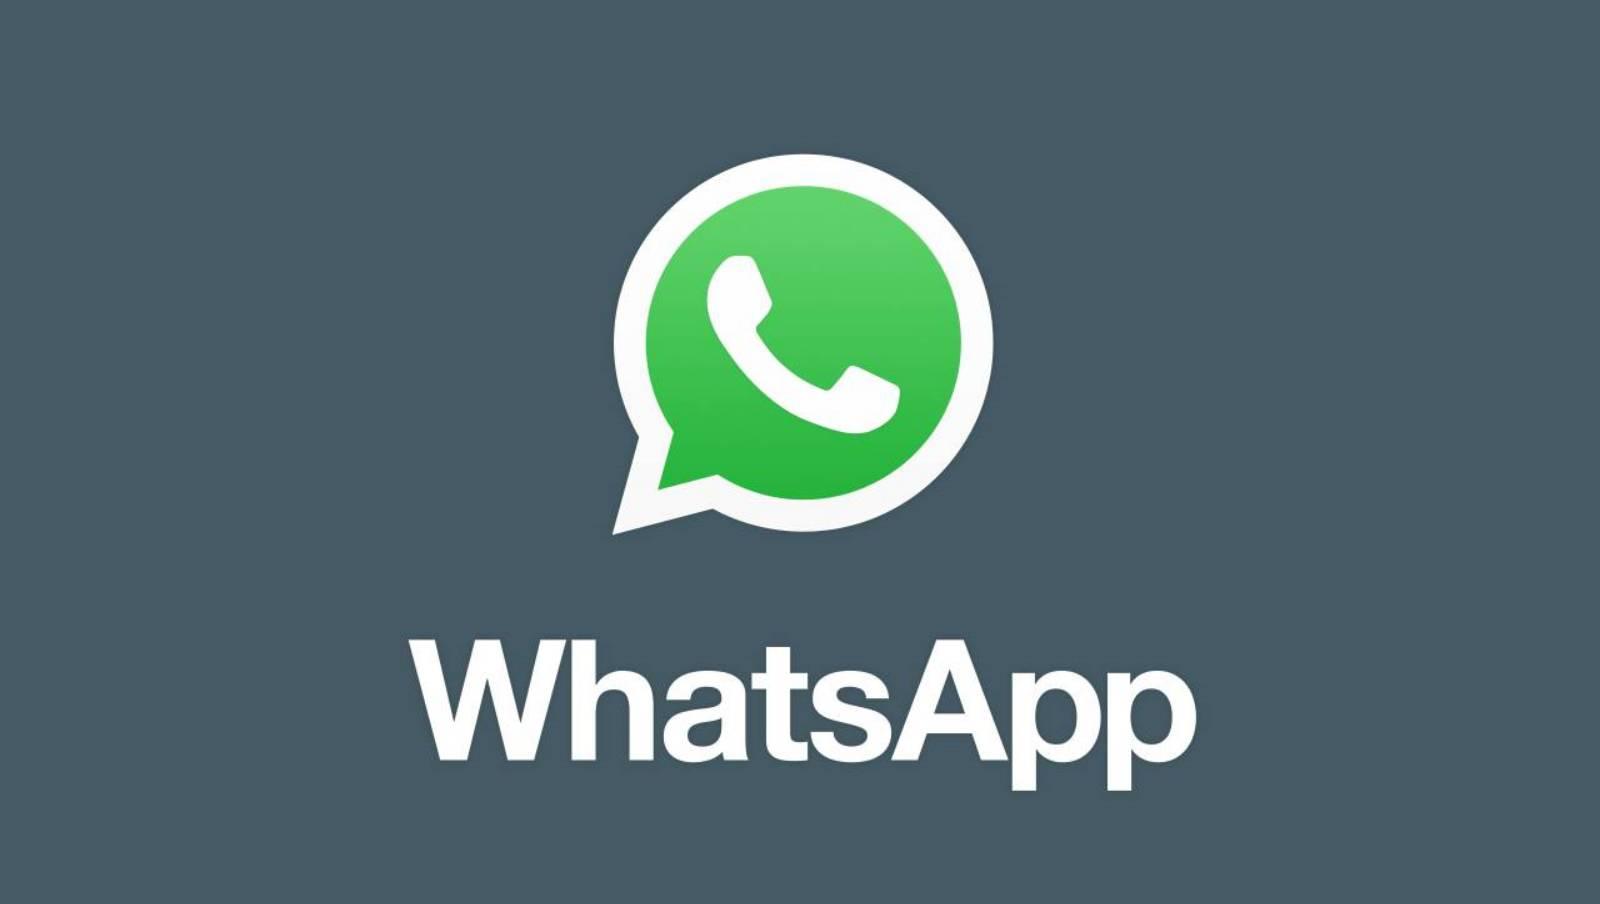 WhatsApp Noua Functie SURPRIZA Totala